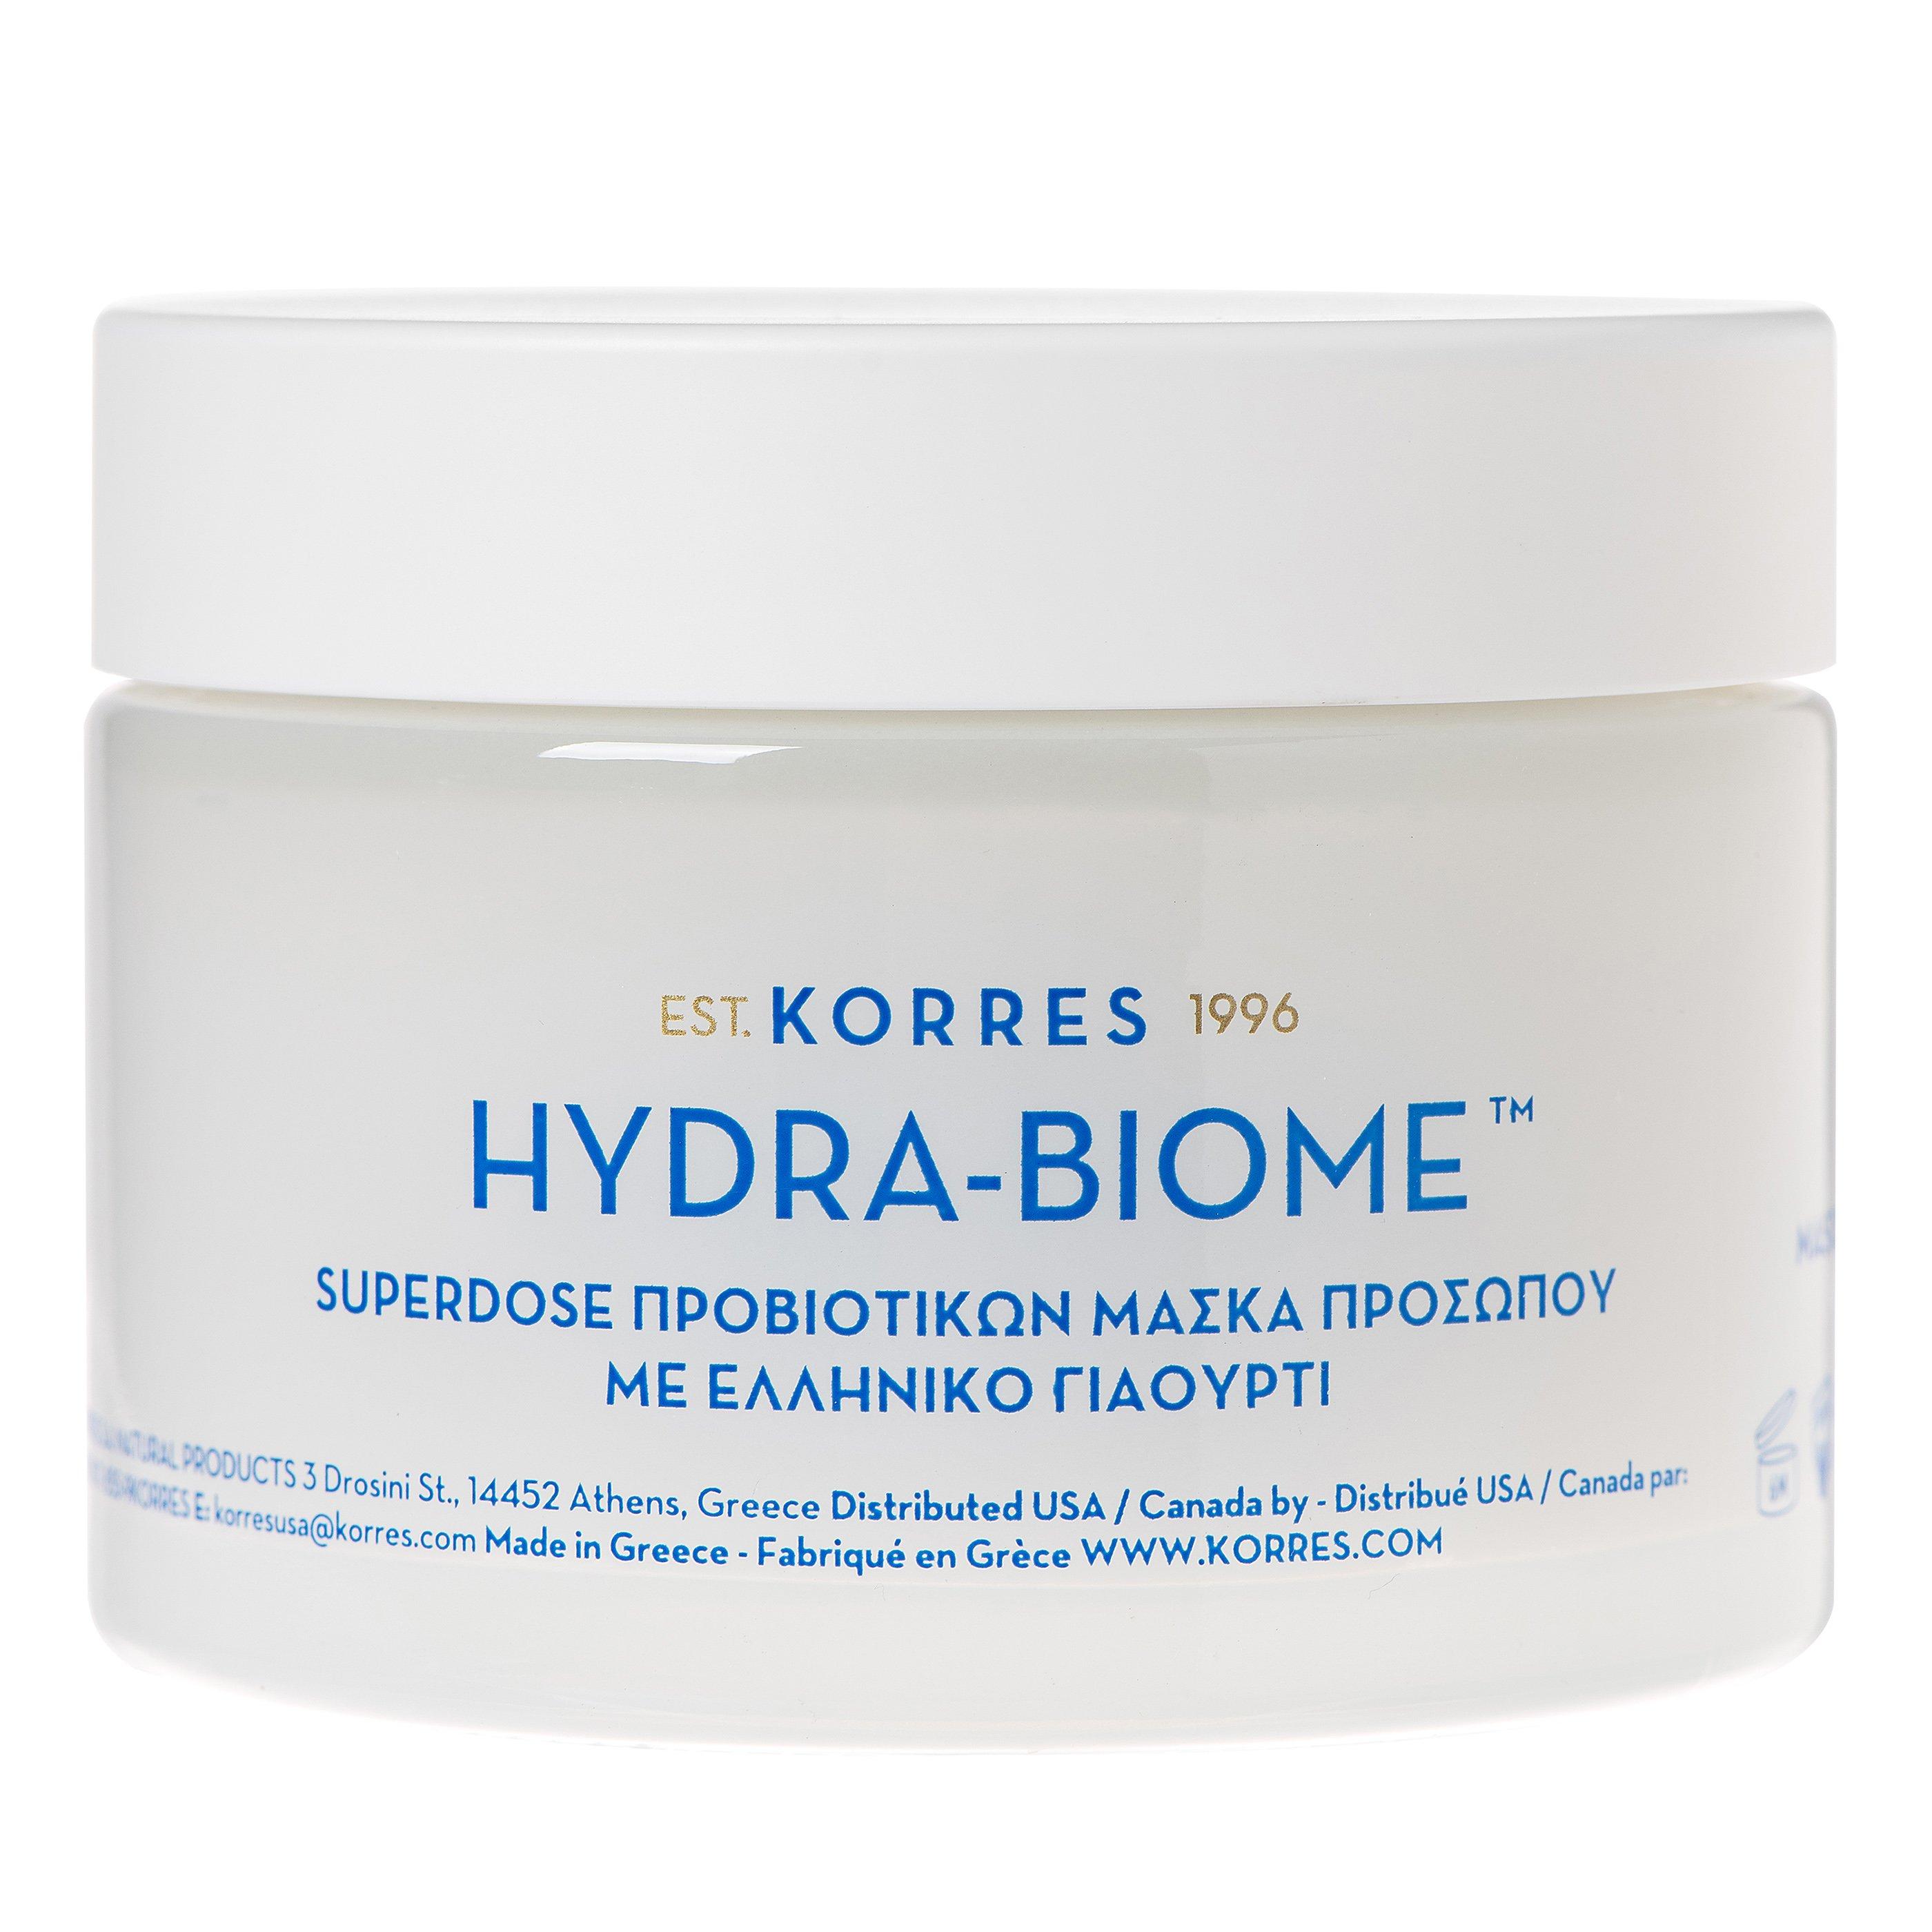 Korres Hydra-Biome Superdose Προβιοτικών, Καινοτομική Μάσκα Προσώπου με Ελληνικό Γιαούρτι για την Διψασμένη Επιδερμίδα 100ml